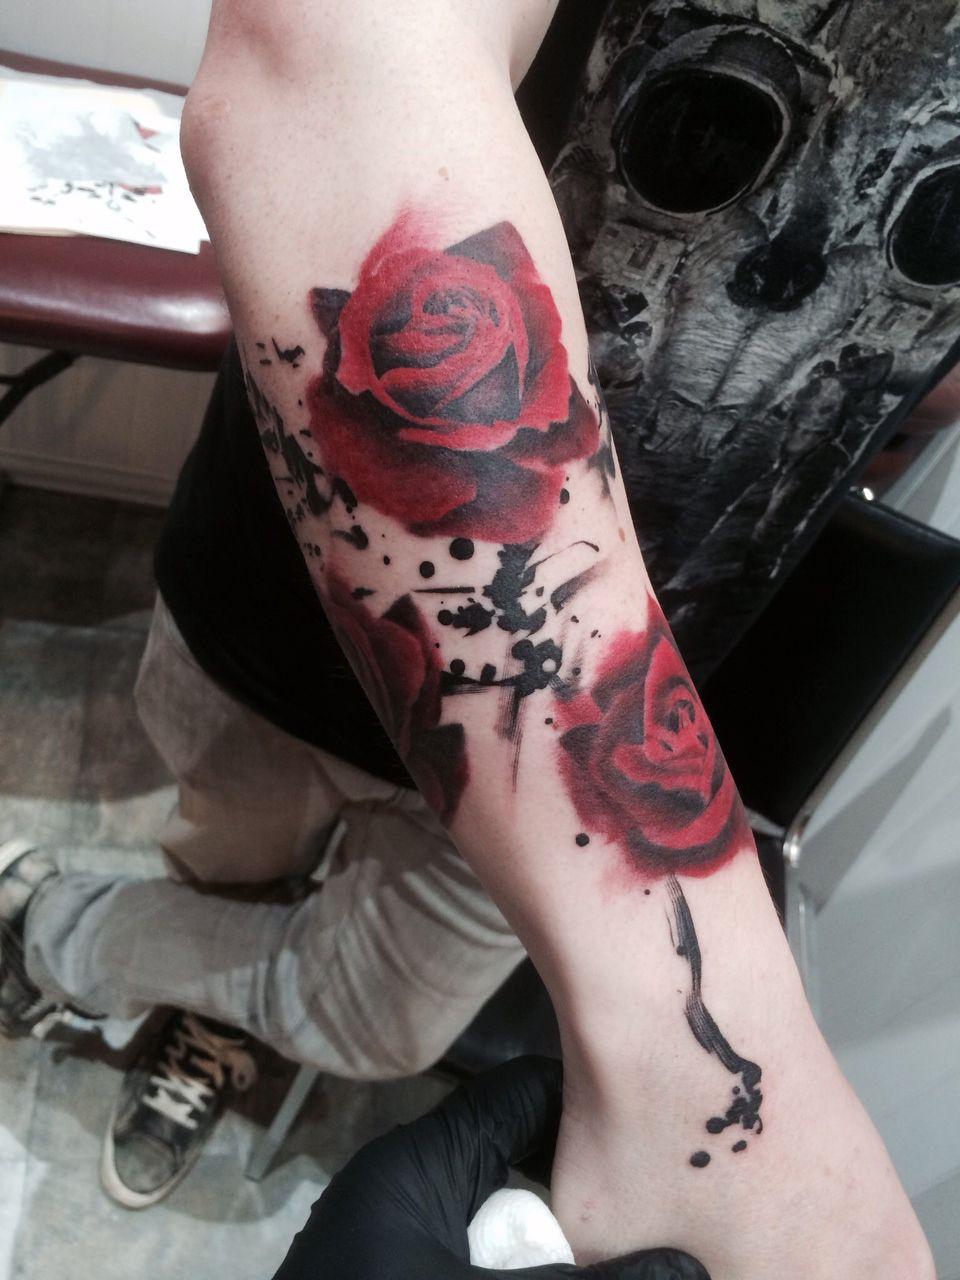 Pete zebley tattoos rose tattoo rose tattoos